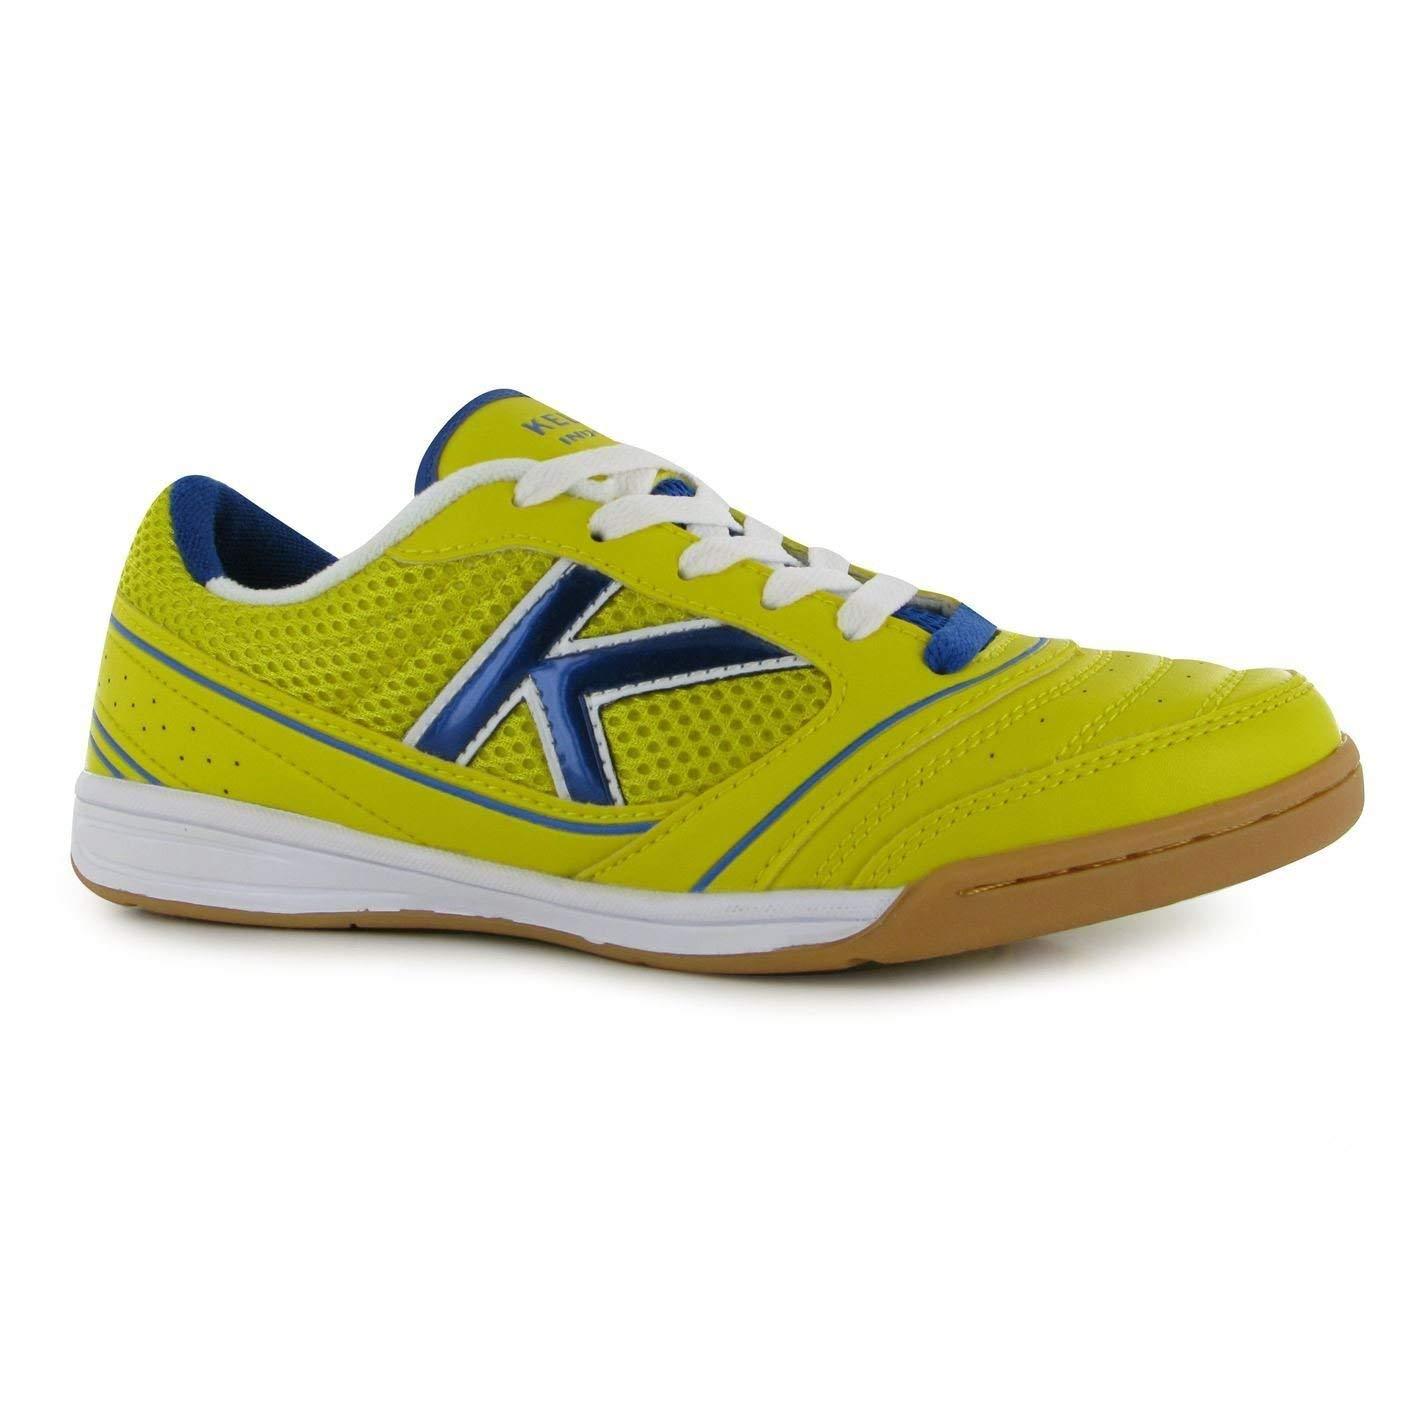 ed4e74033 Get Quotations · Kelme America Indoor Football Futsal Trainers Mens  Lemon/Royal Soccer Sneakers